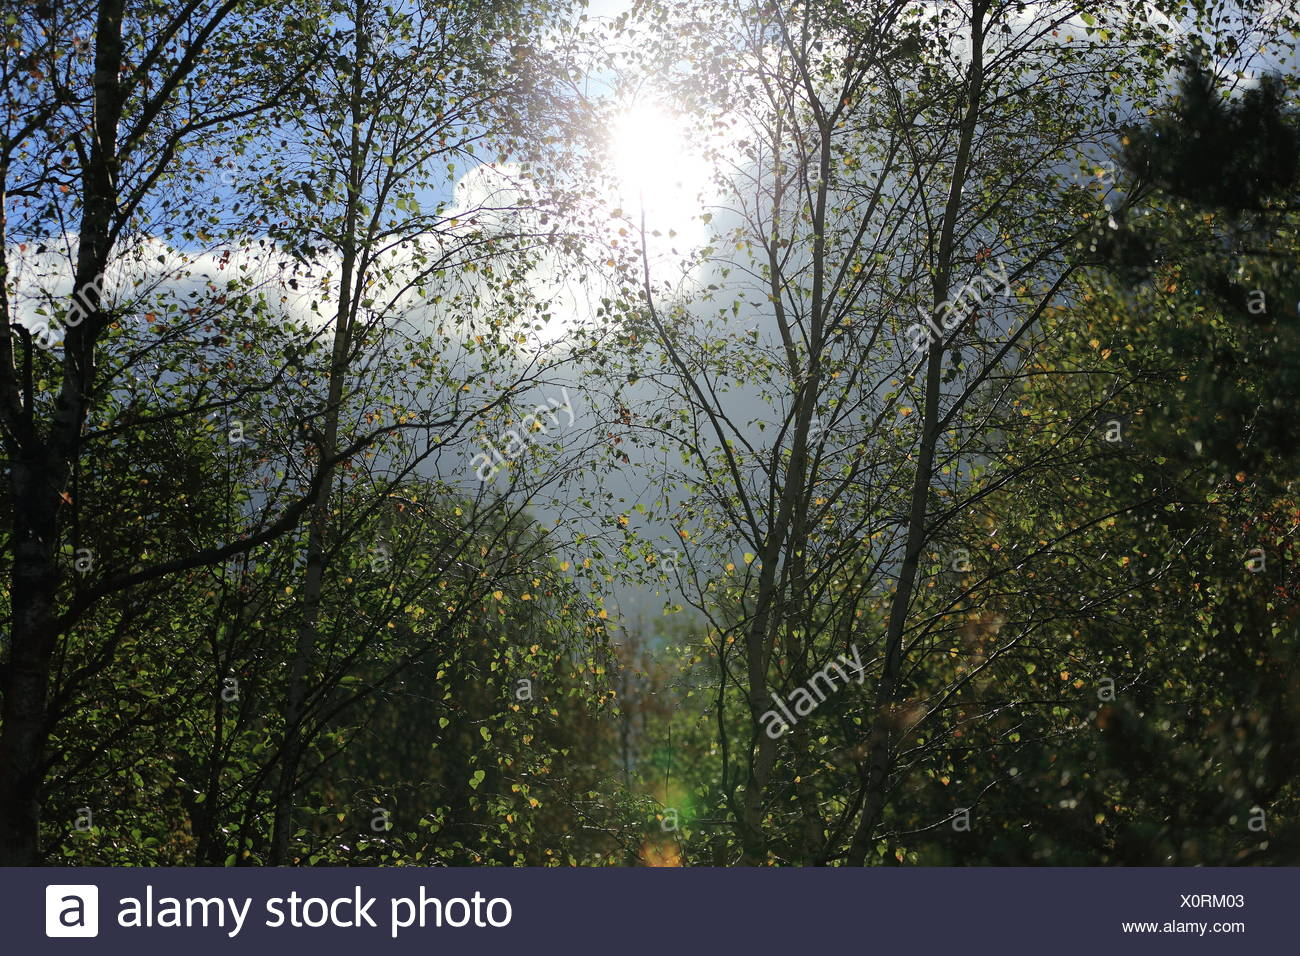 Sun Shining Through Branches - Stock Image